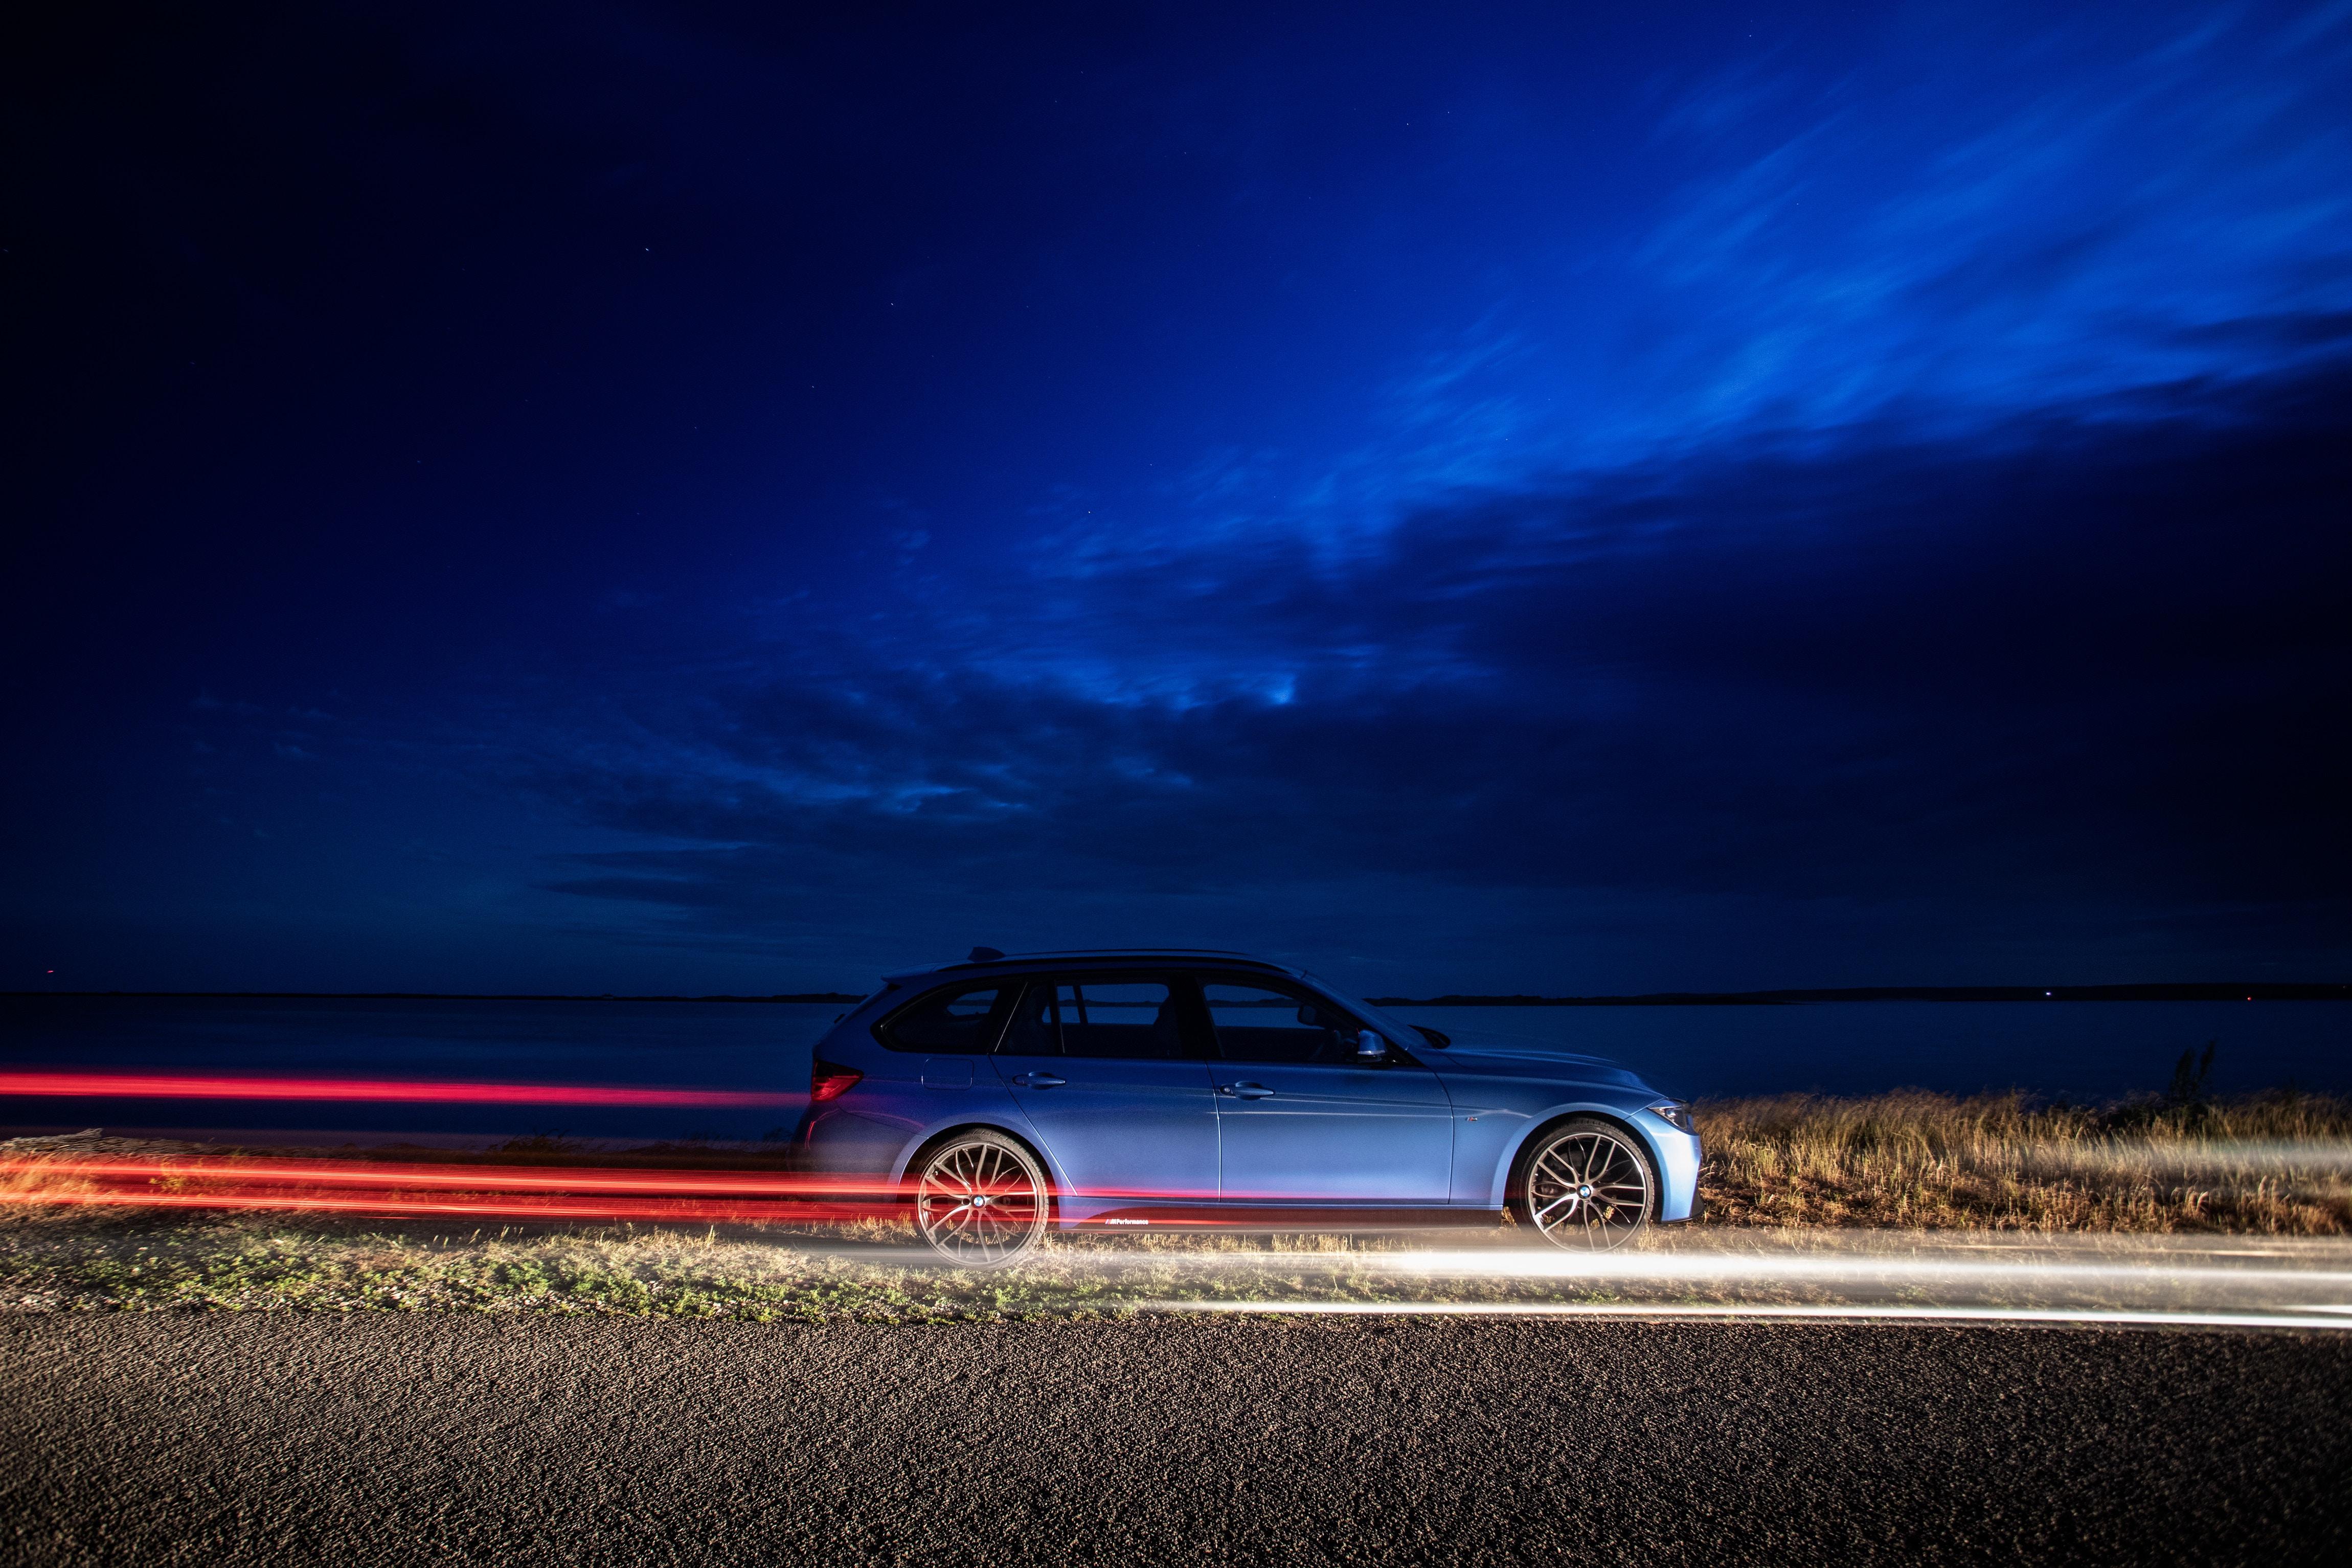 BMW simulacion Abaqus